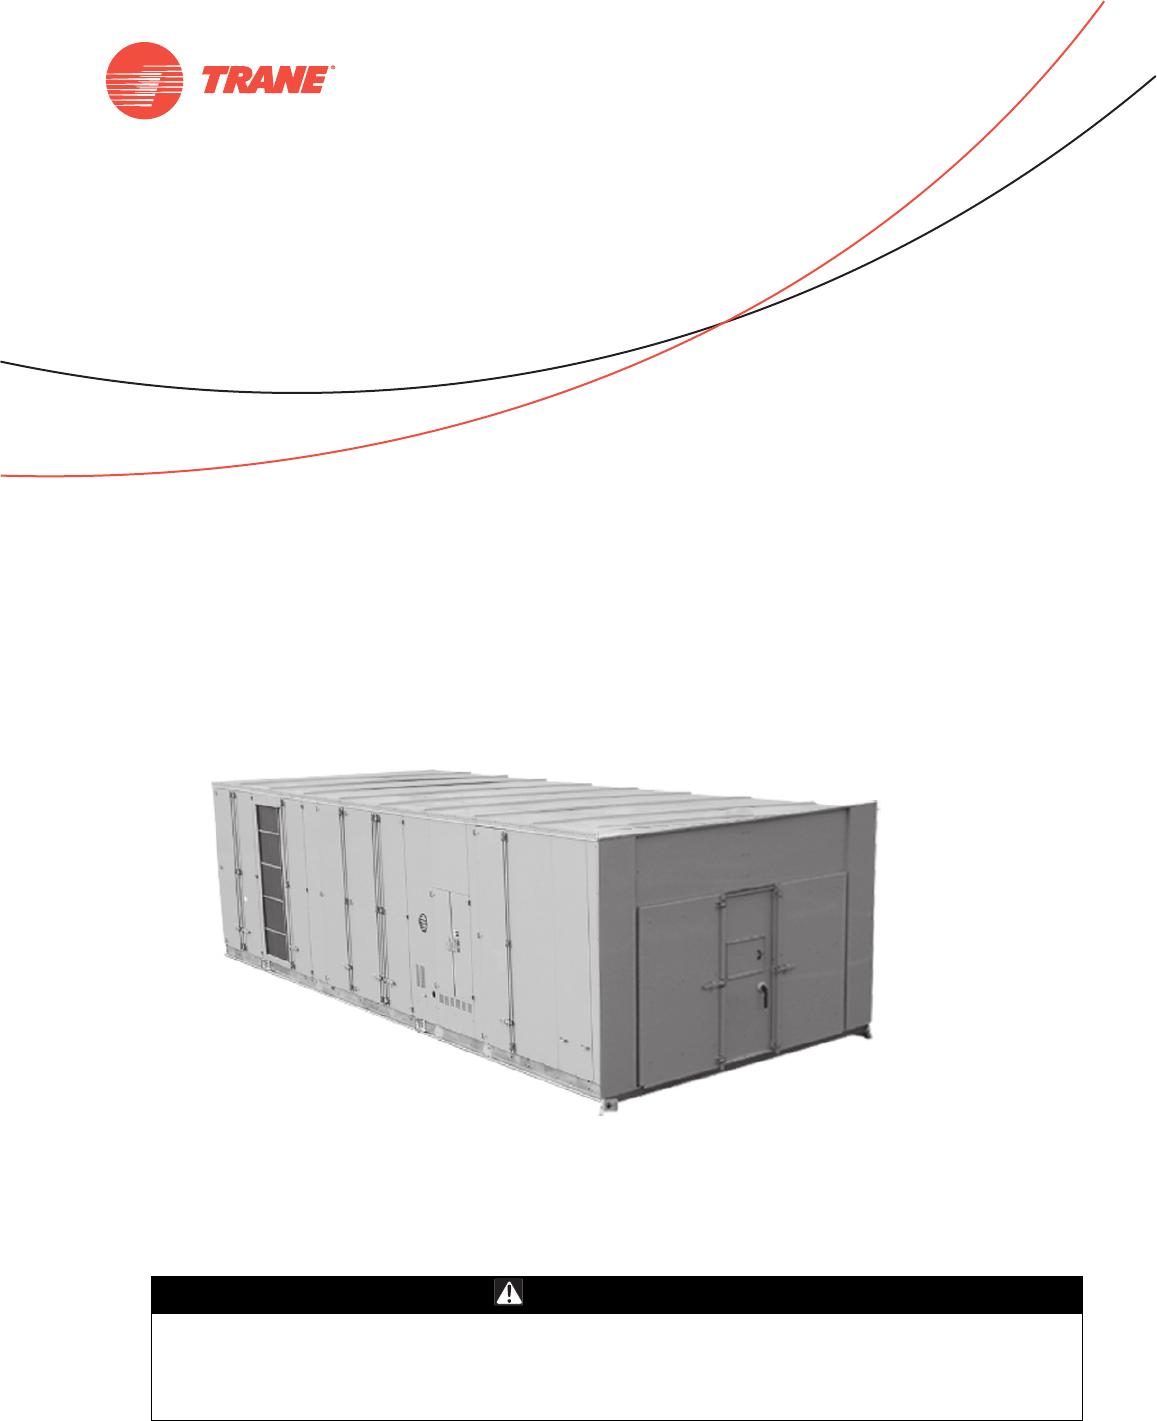 Trane Intellipak Ii 90 To 162 Tons Installation And Maintenance Baysens019c Thermostat Wiring Diagram Safety Warning